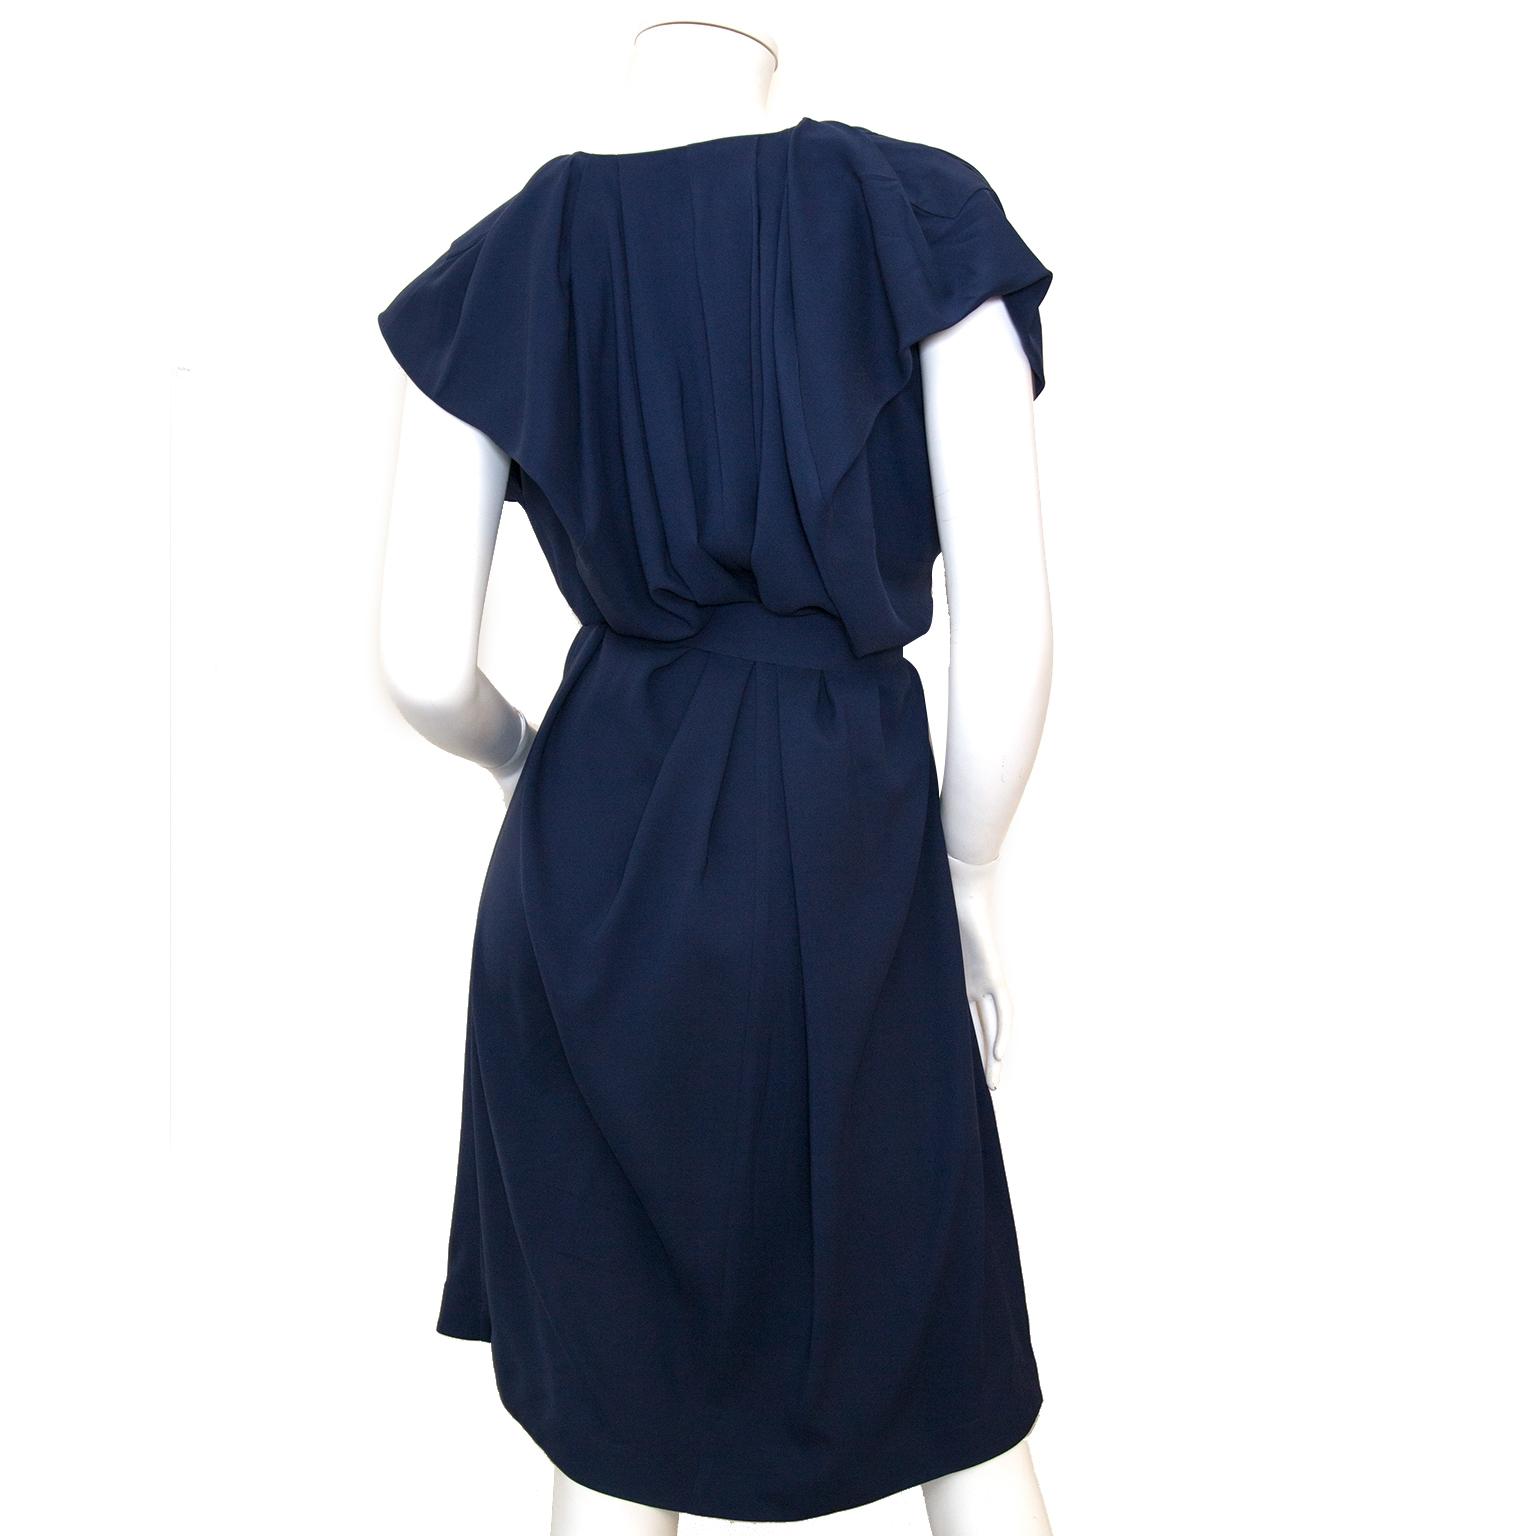 Buy 100% authentic Balenciaga Blue V Neck Silk Dress